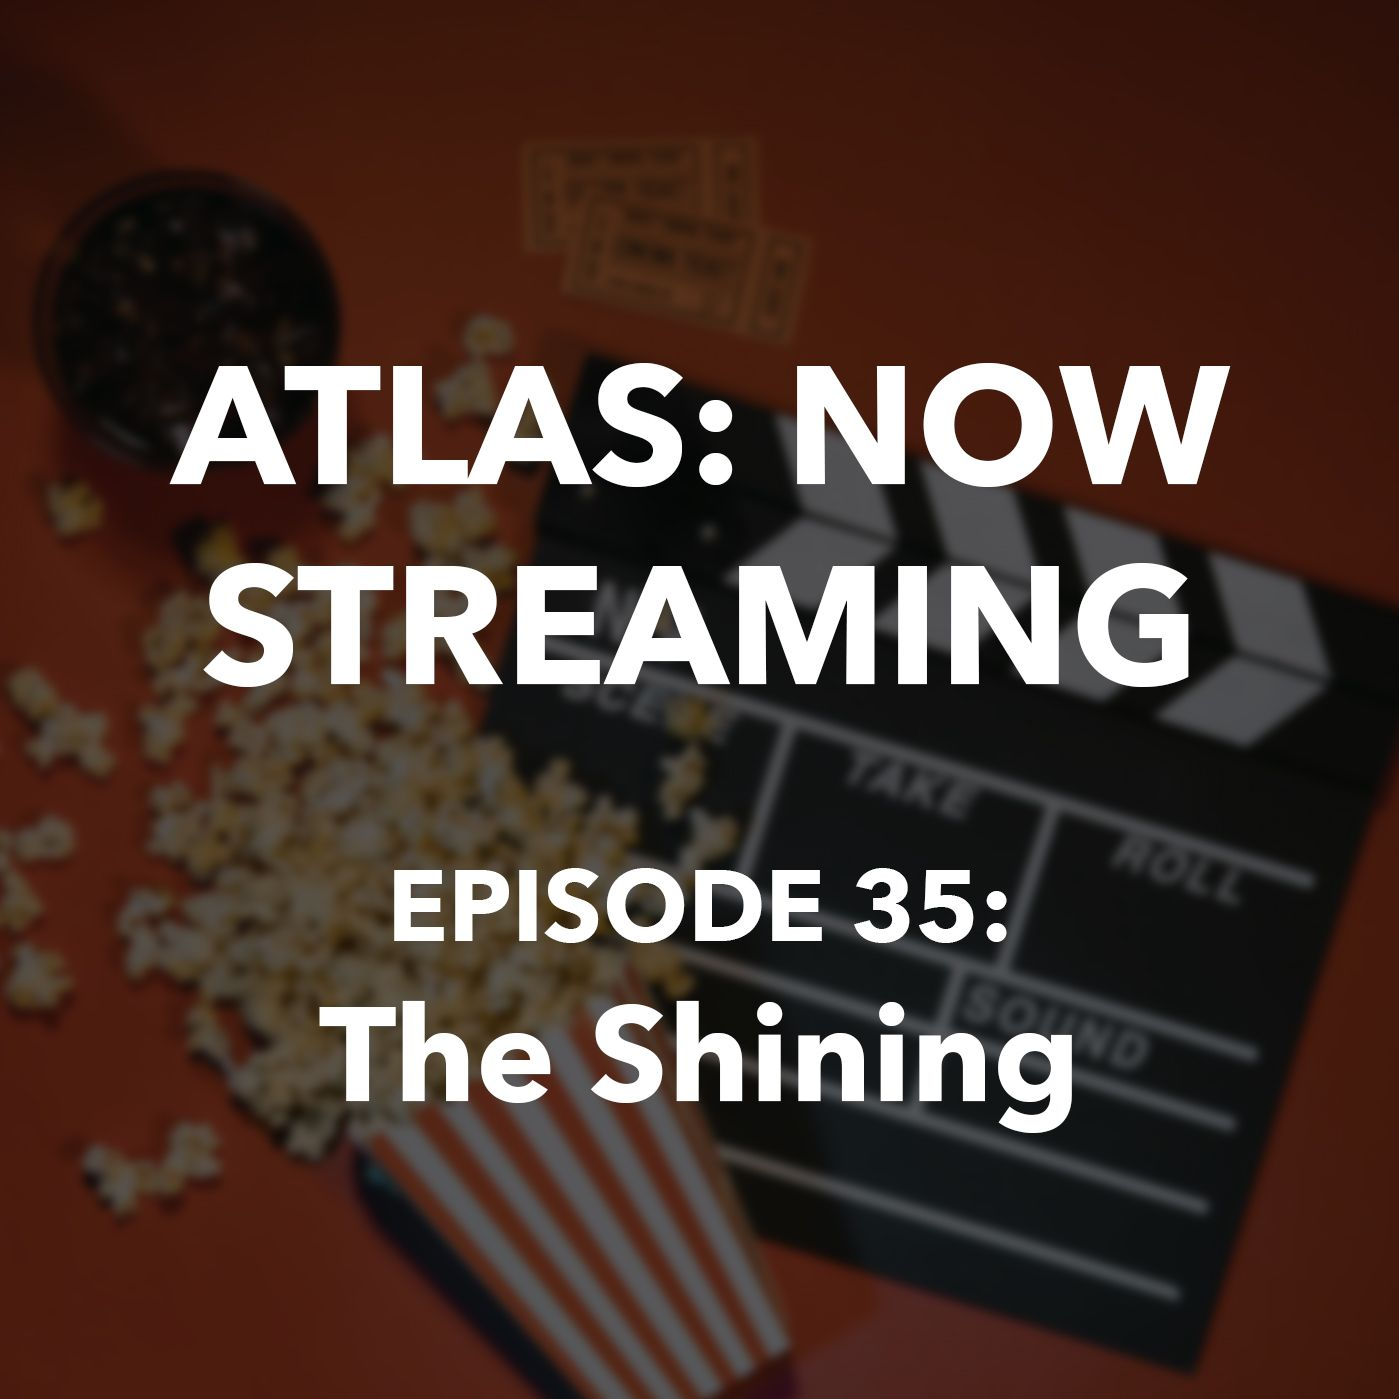 The Shining - Stephen King, Stanley Kubrick - Atlas: Now Streaming Episode 35